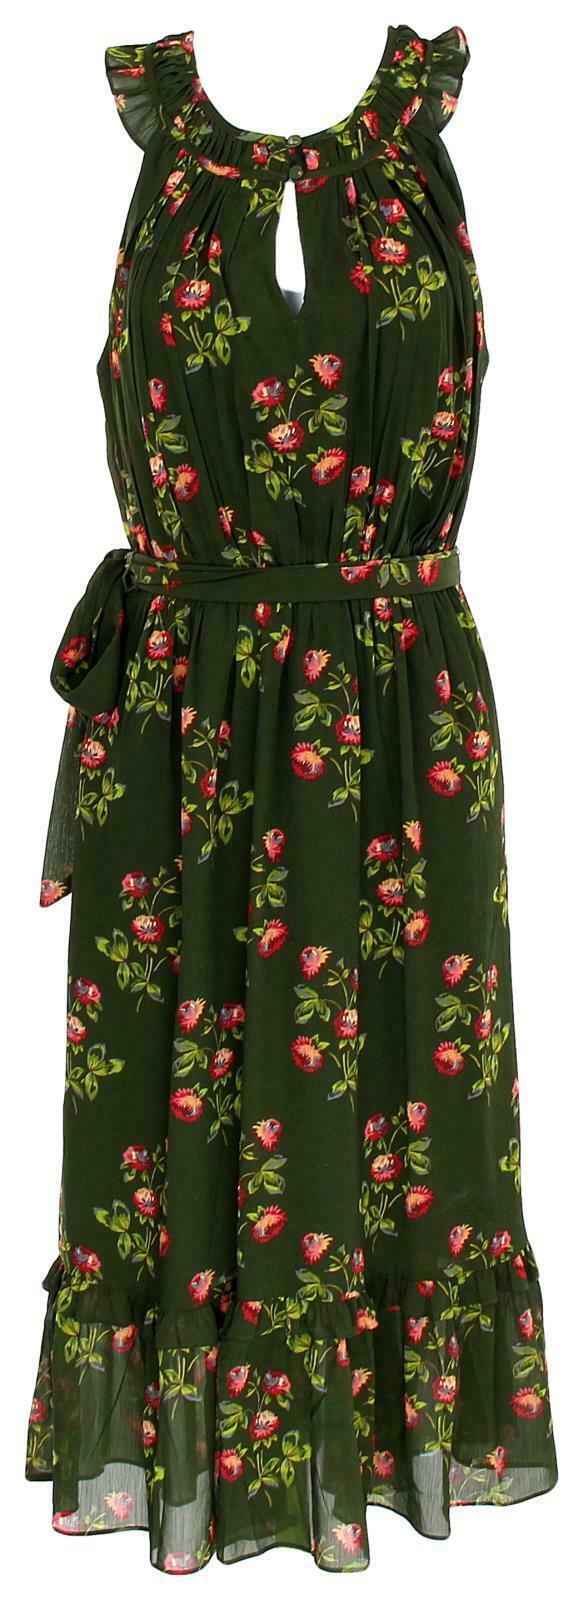 J Crew Women's Point Sur High-Neck Ruffle Floral Dress Chiffon 4 J5088